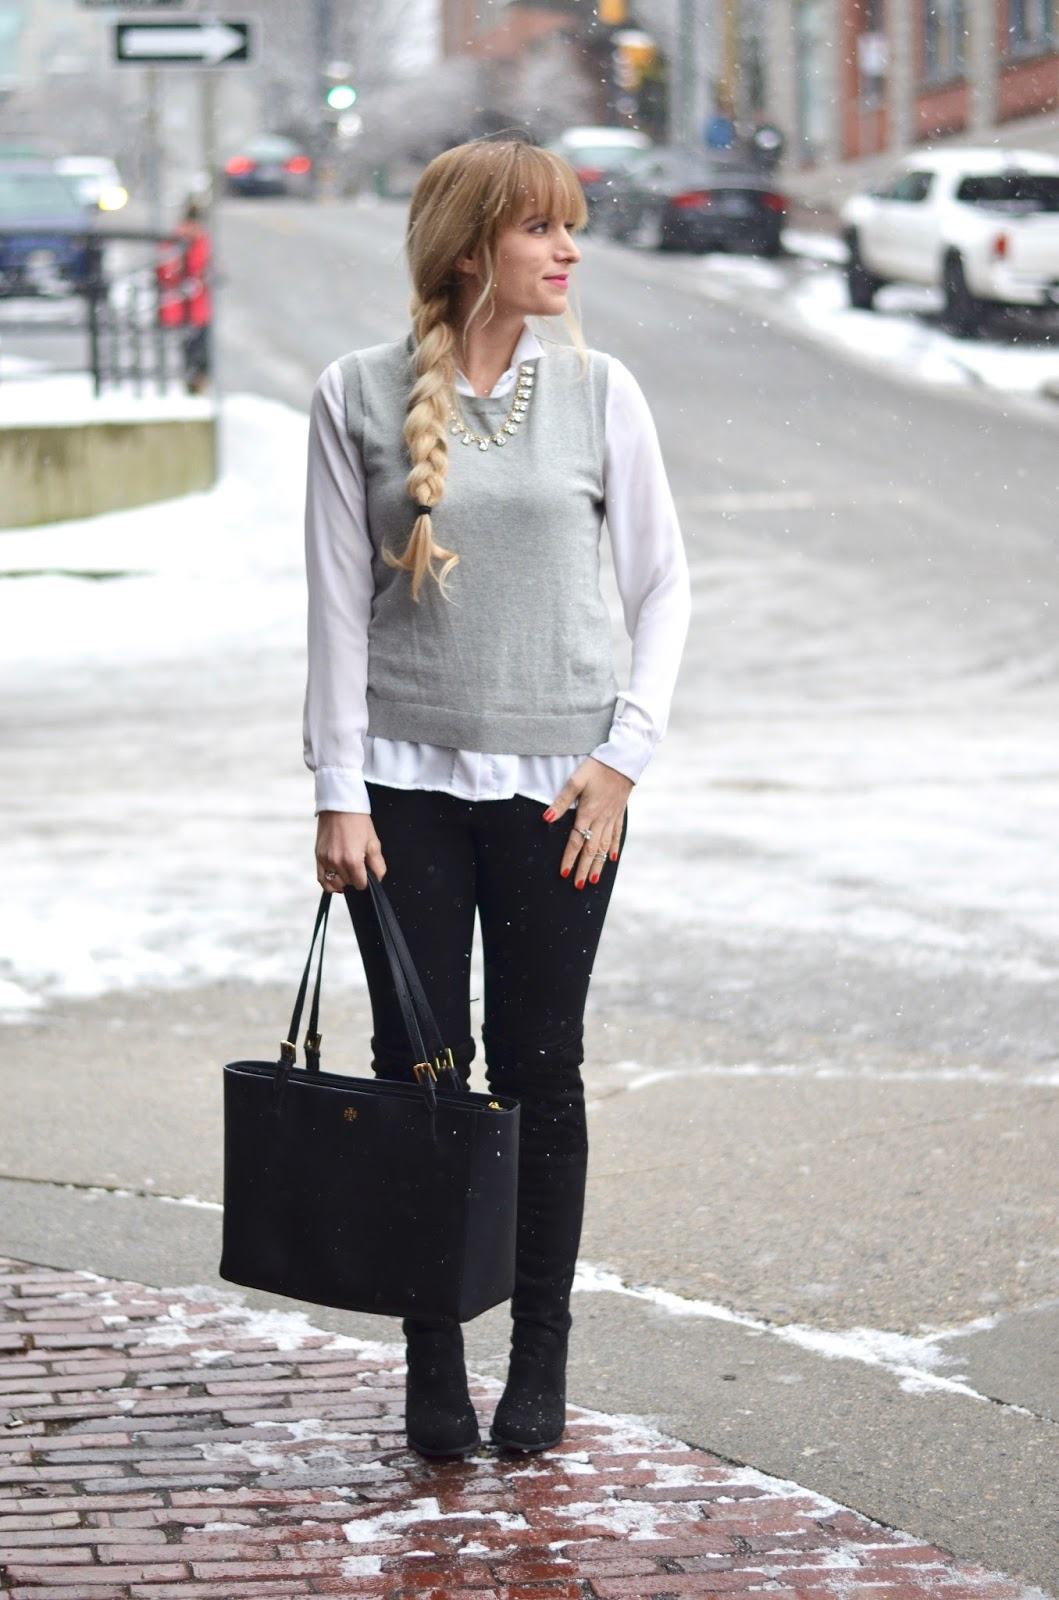 sweater vest outfit idea